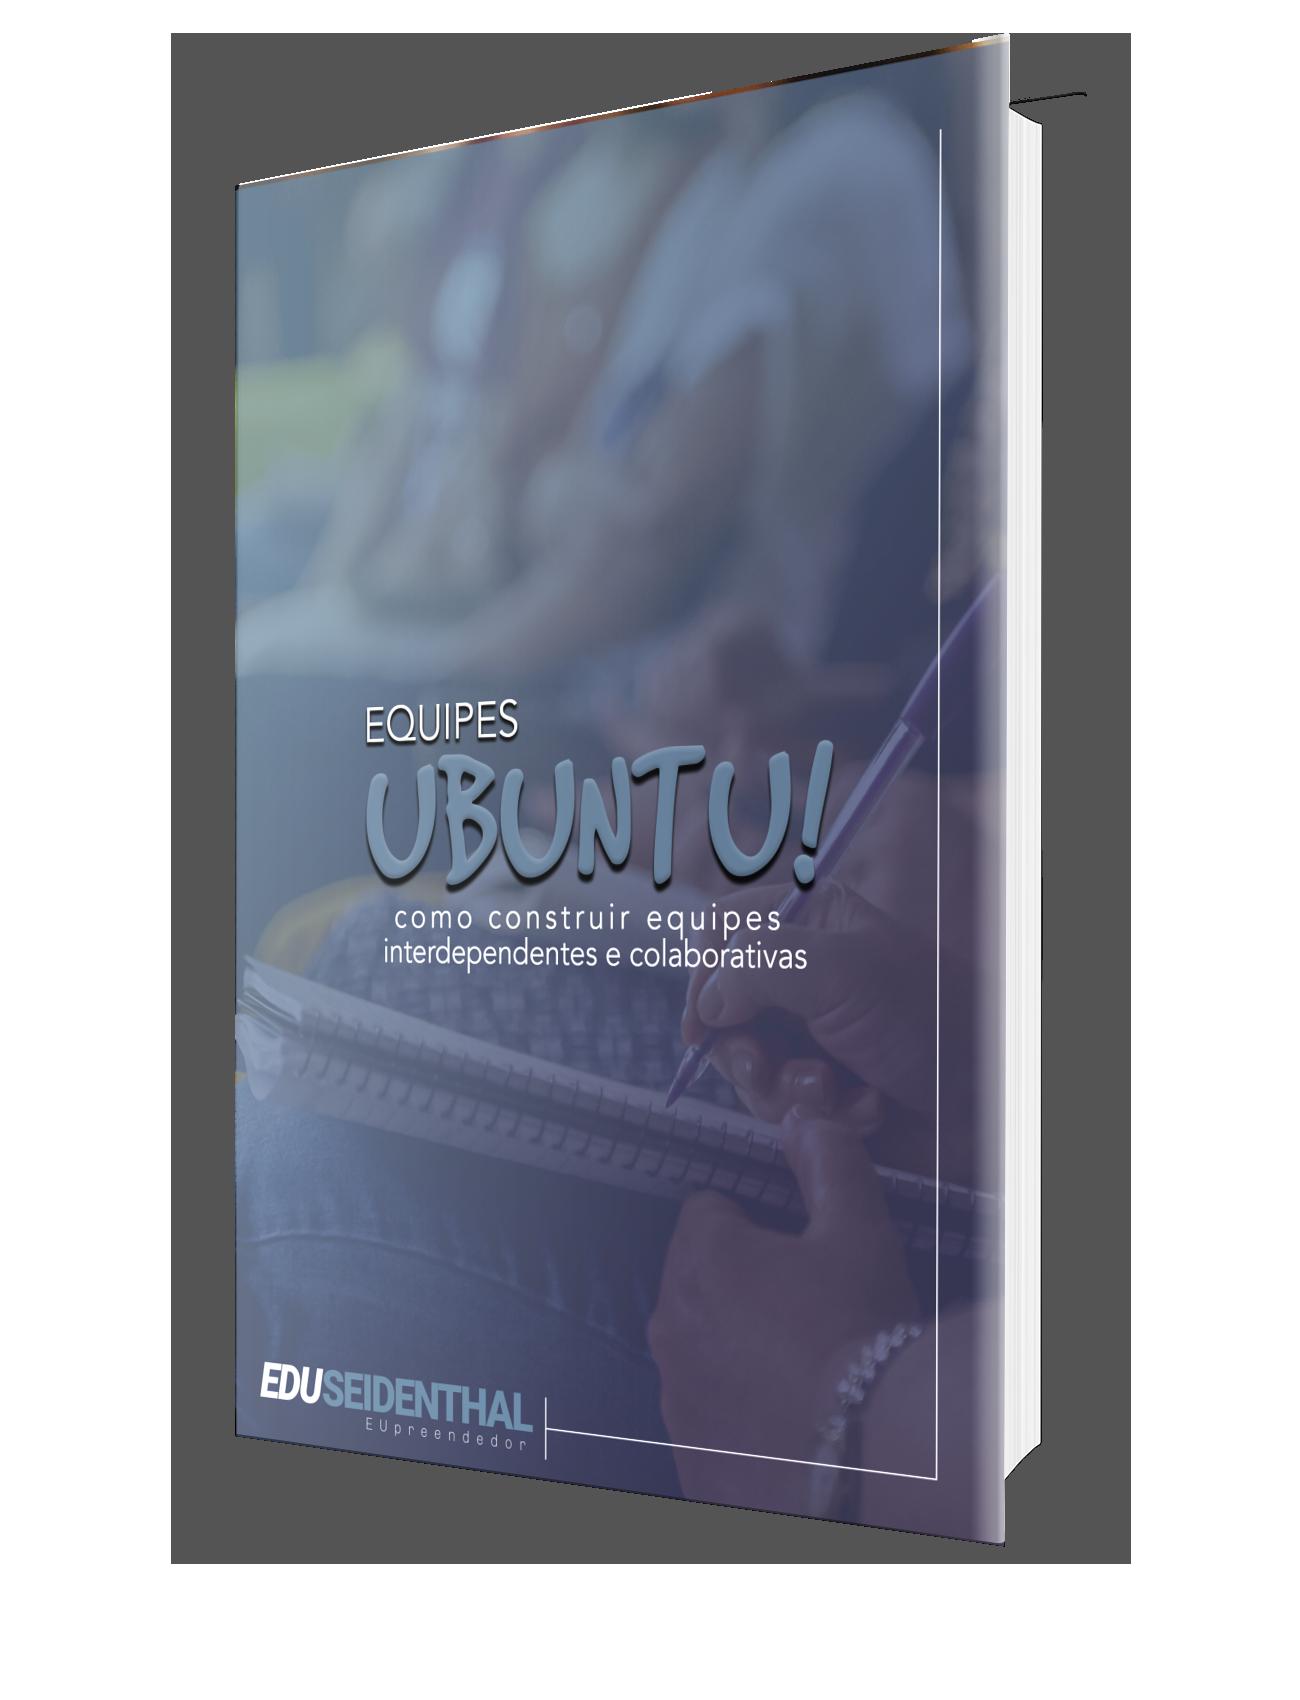 Mock Up Equipes Ubuntu! Por Edu Seidenthal.png